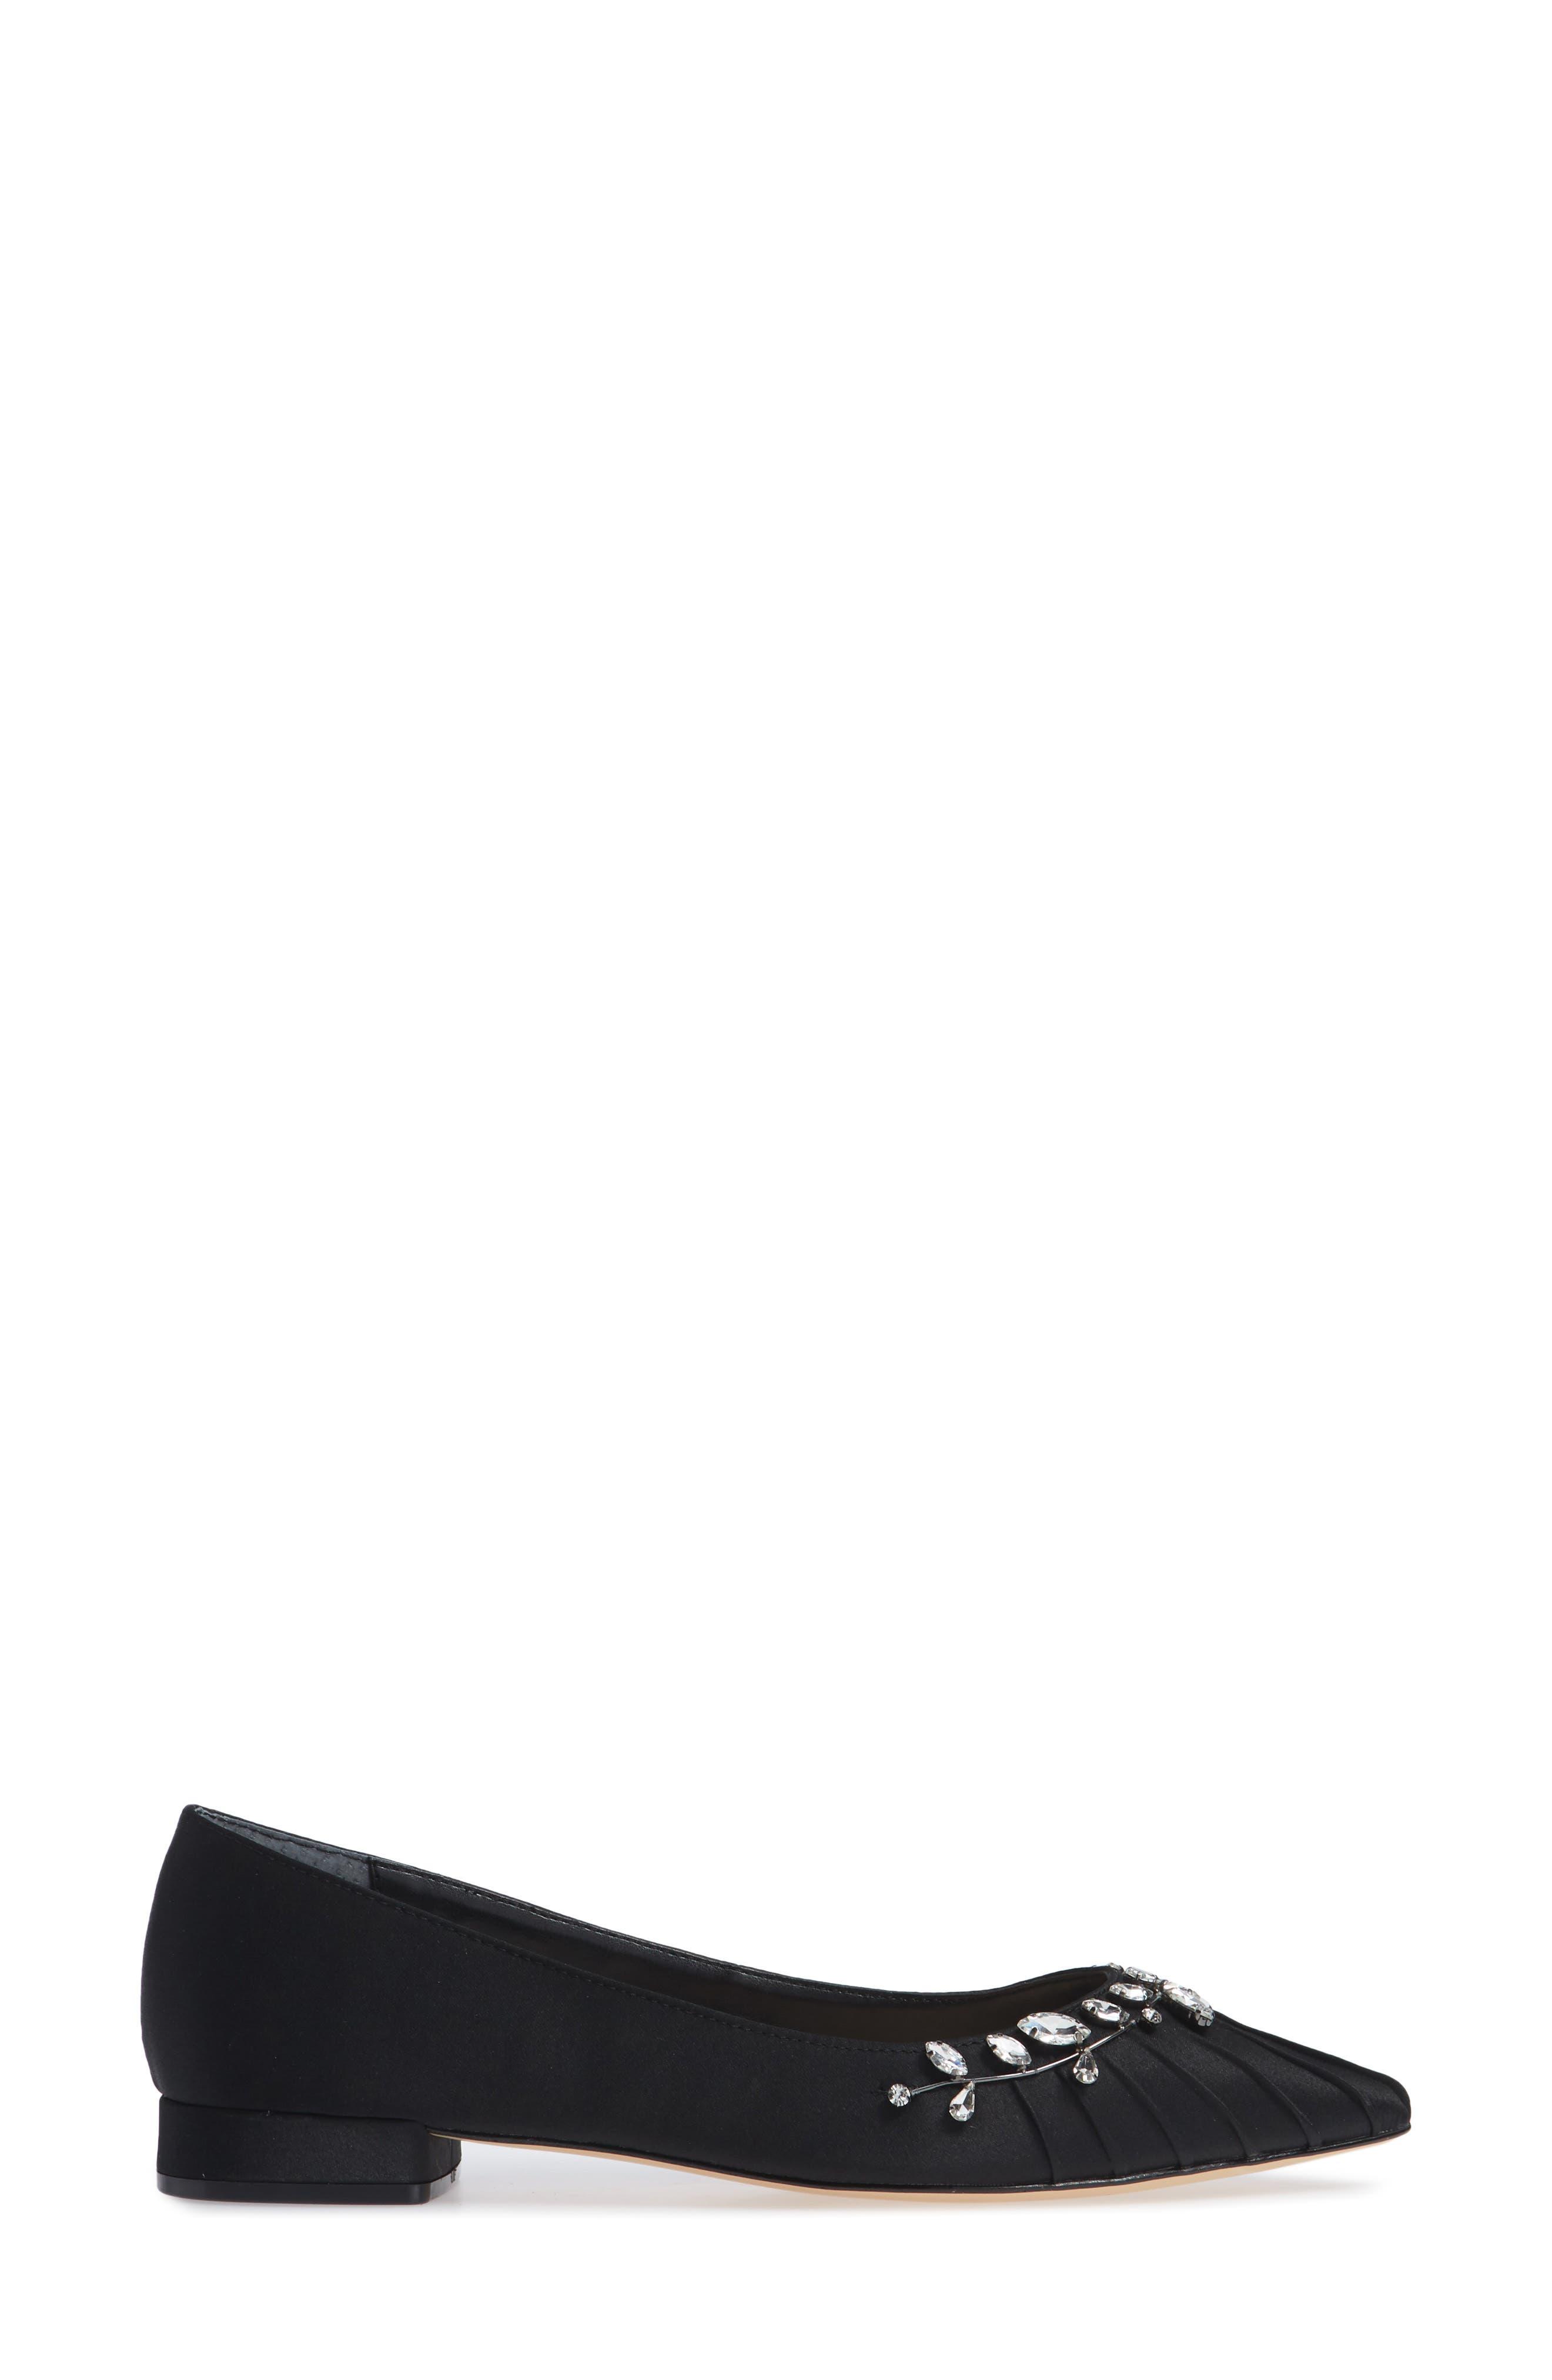 NINA, Zenida Jeweled Skimmer, Alternate thumbnail 3, color, BLACK SATIN